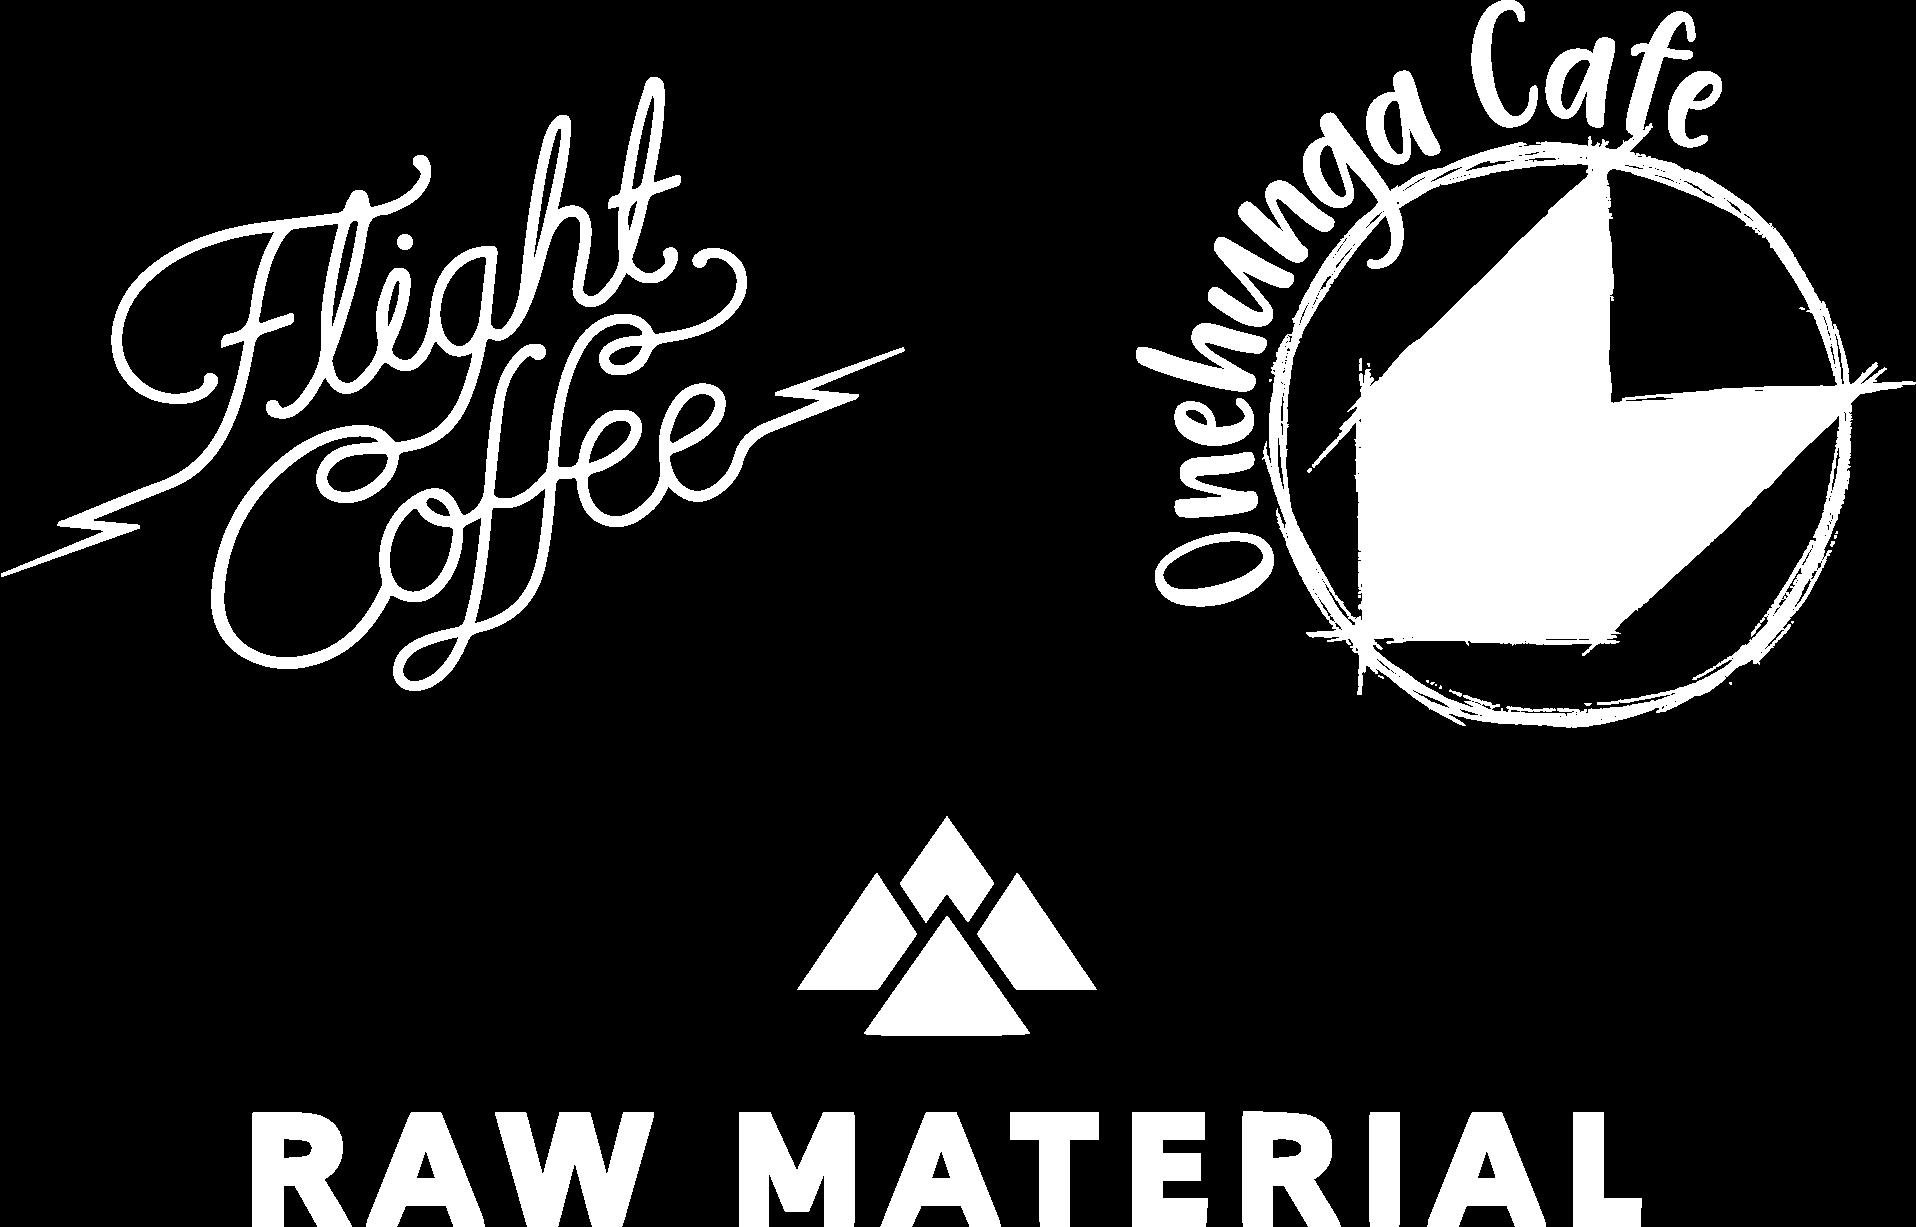 Onehunga_RawMaterial_logos